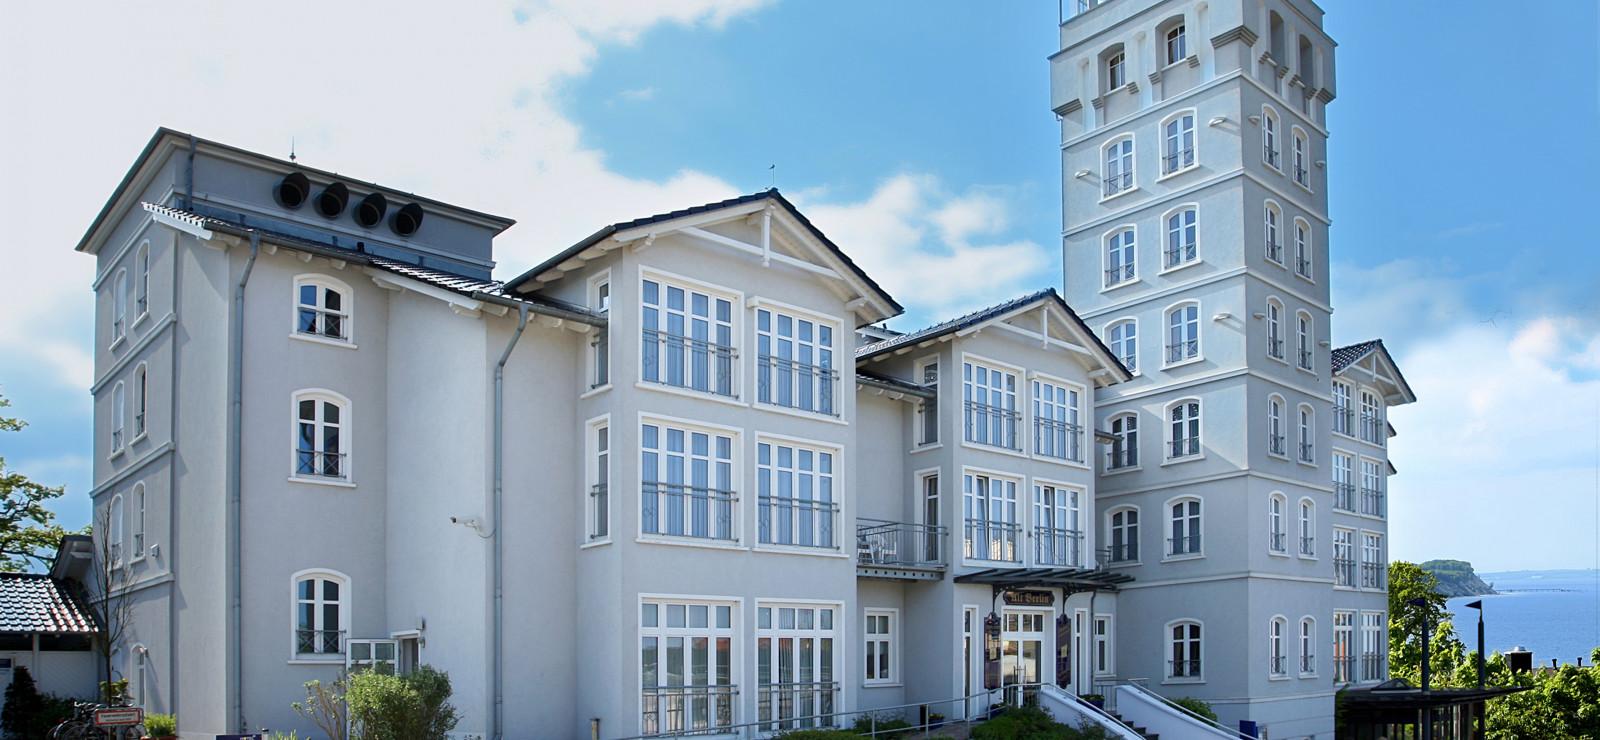 Hotel Hanseatic Rügen & Villen Bilder | Bild 1